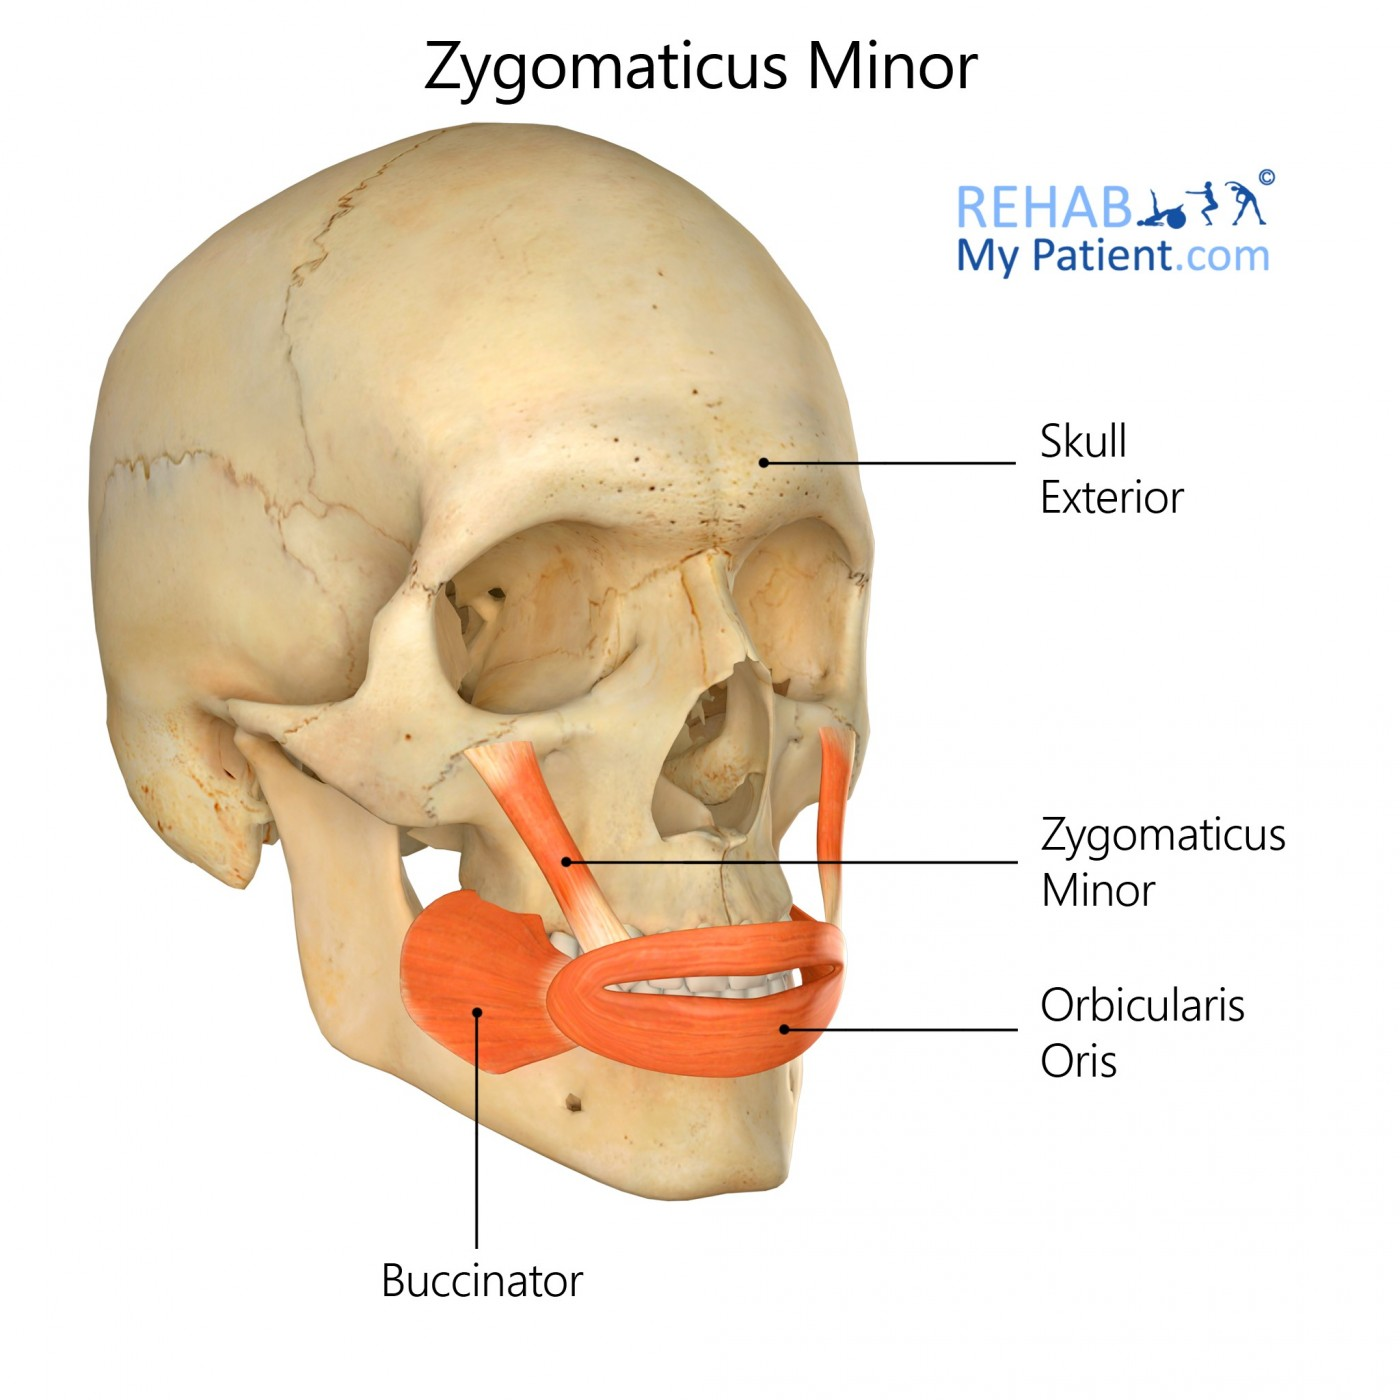 Zygomaticus Minor